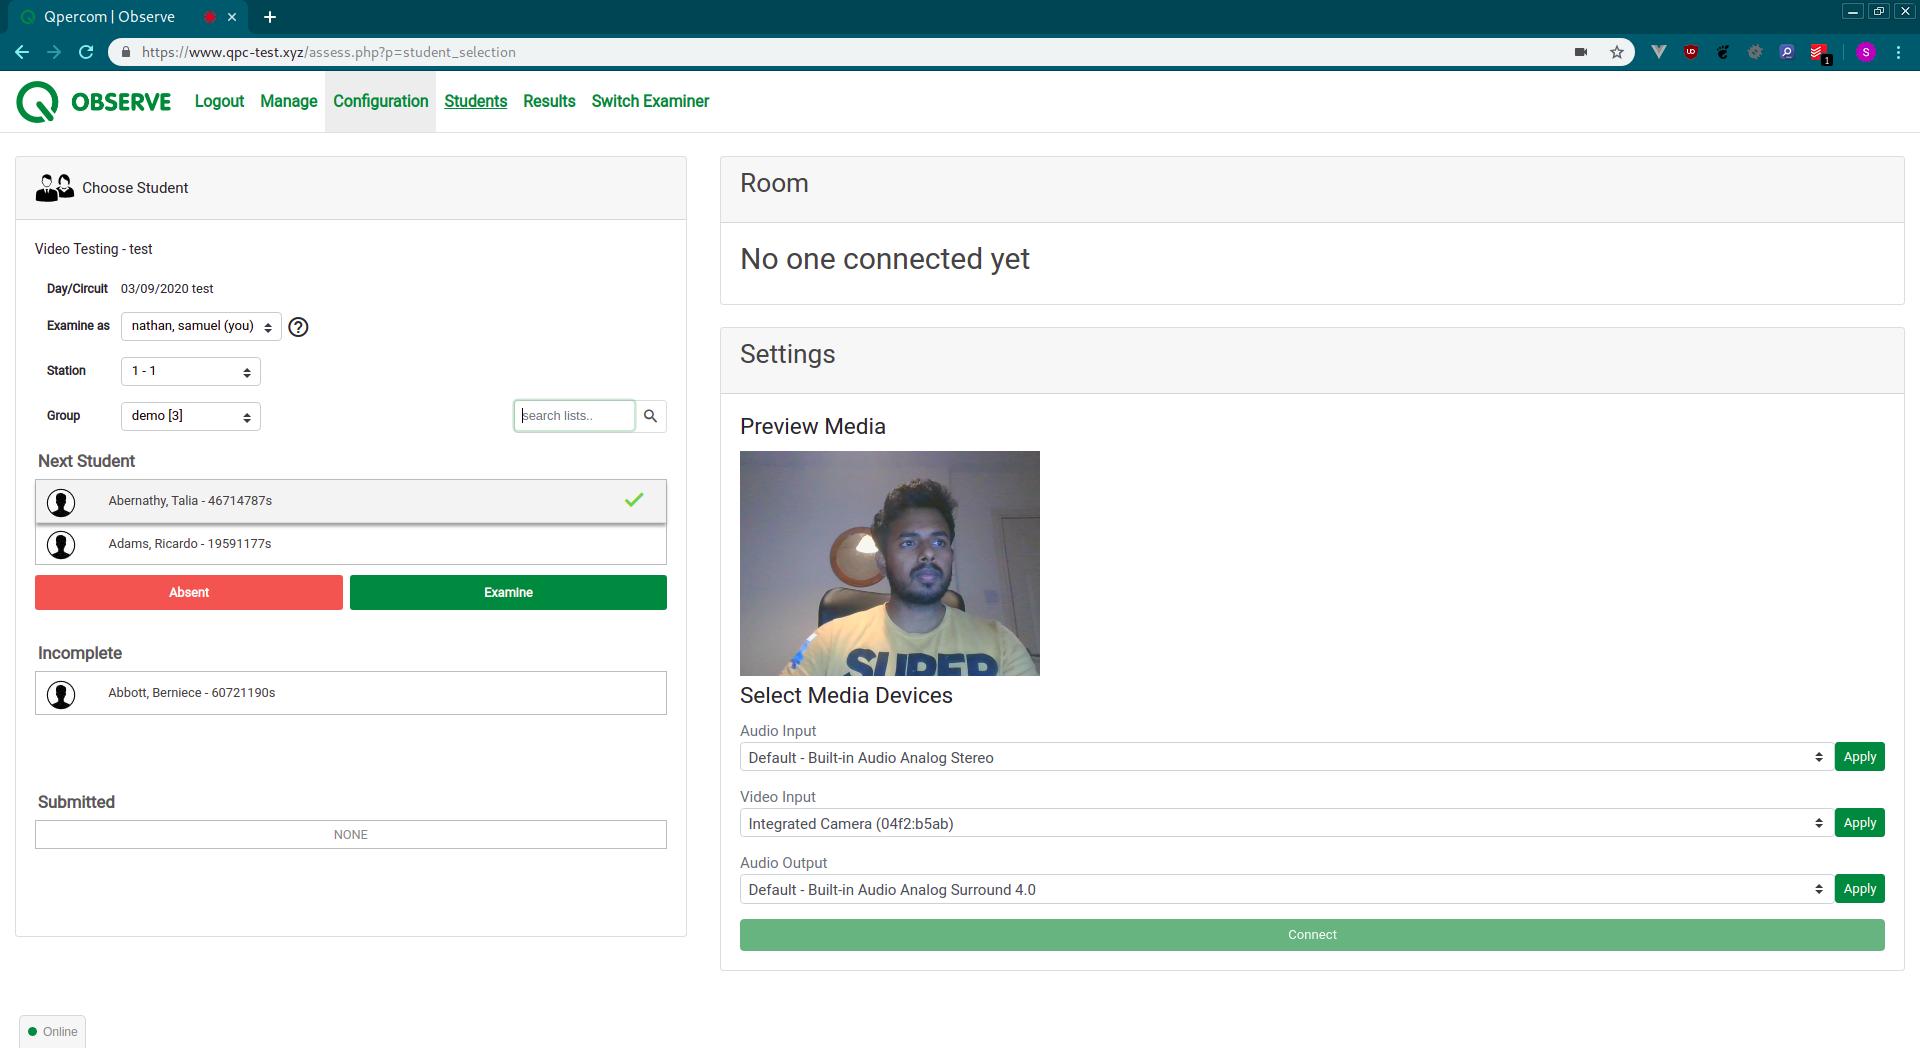 Screenshot from Qpercom Observe VI